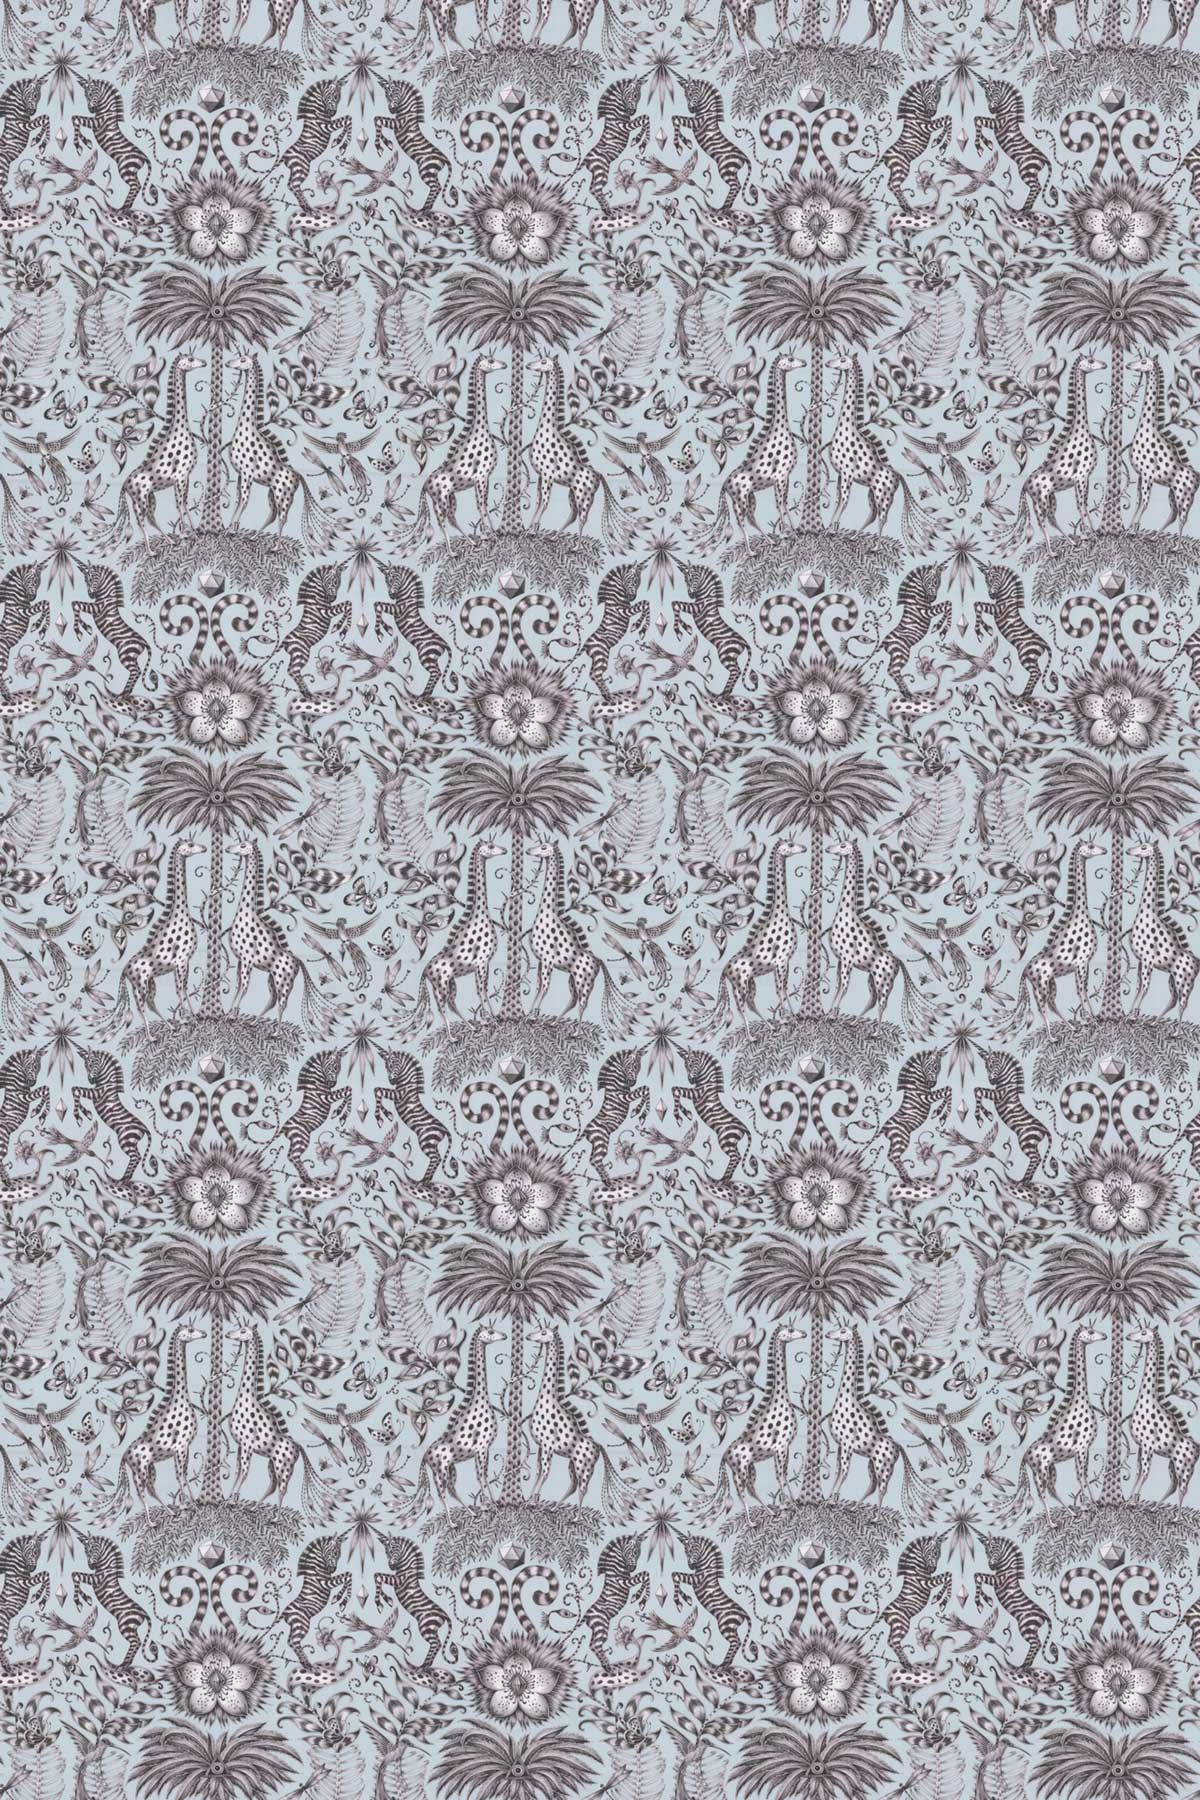 Emma J Shipley Kruger Duck egg Fabric - Product code: F1111/01